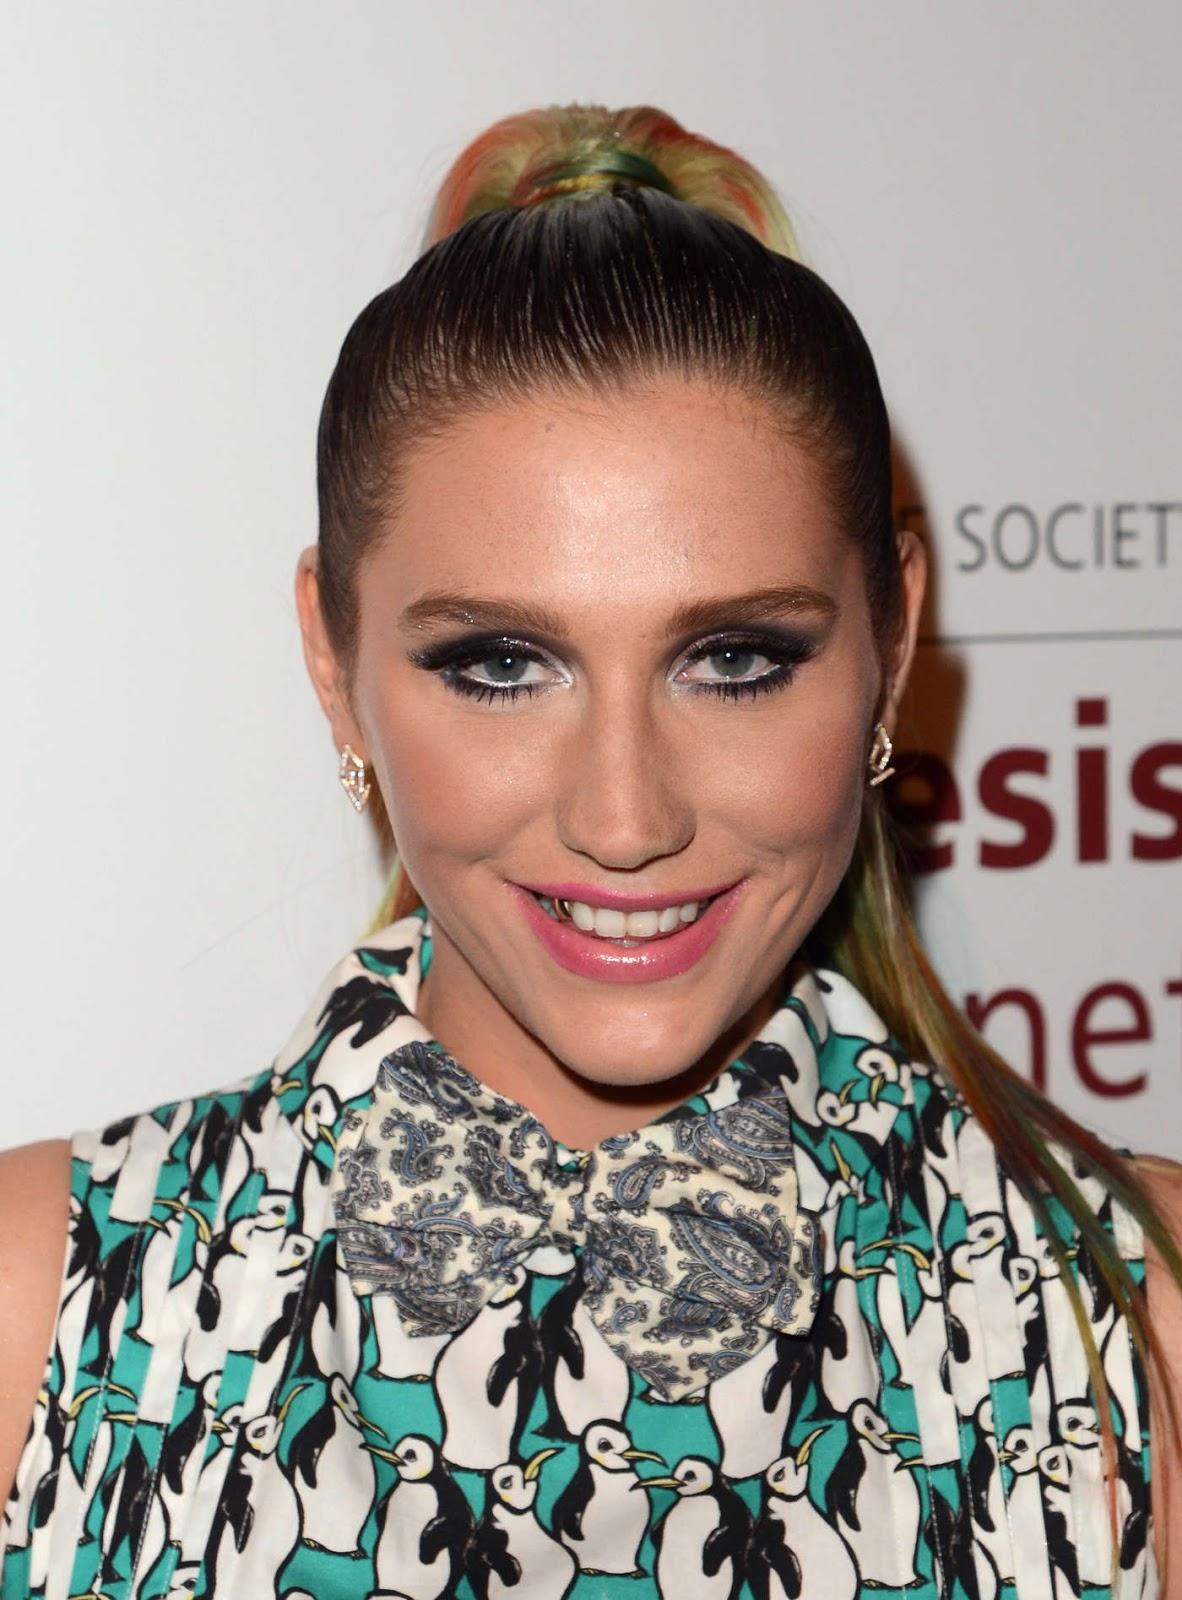 Kesha Hot Pictures at 2013 Genesis Awards Benefit Gala in LAKesha 2013 Photoshoot